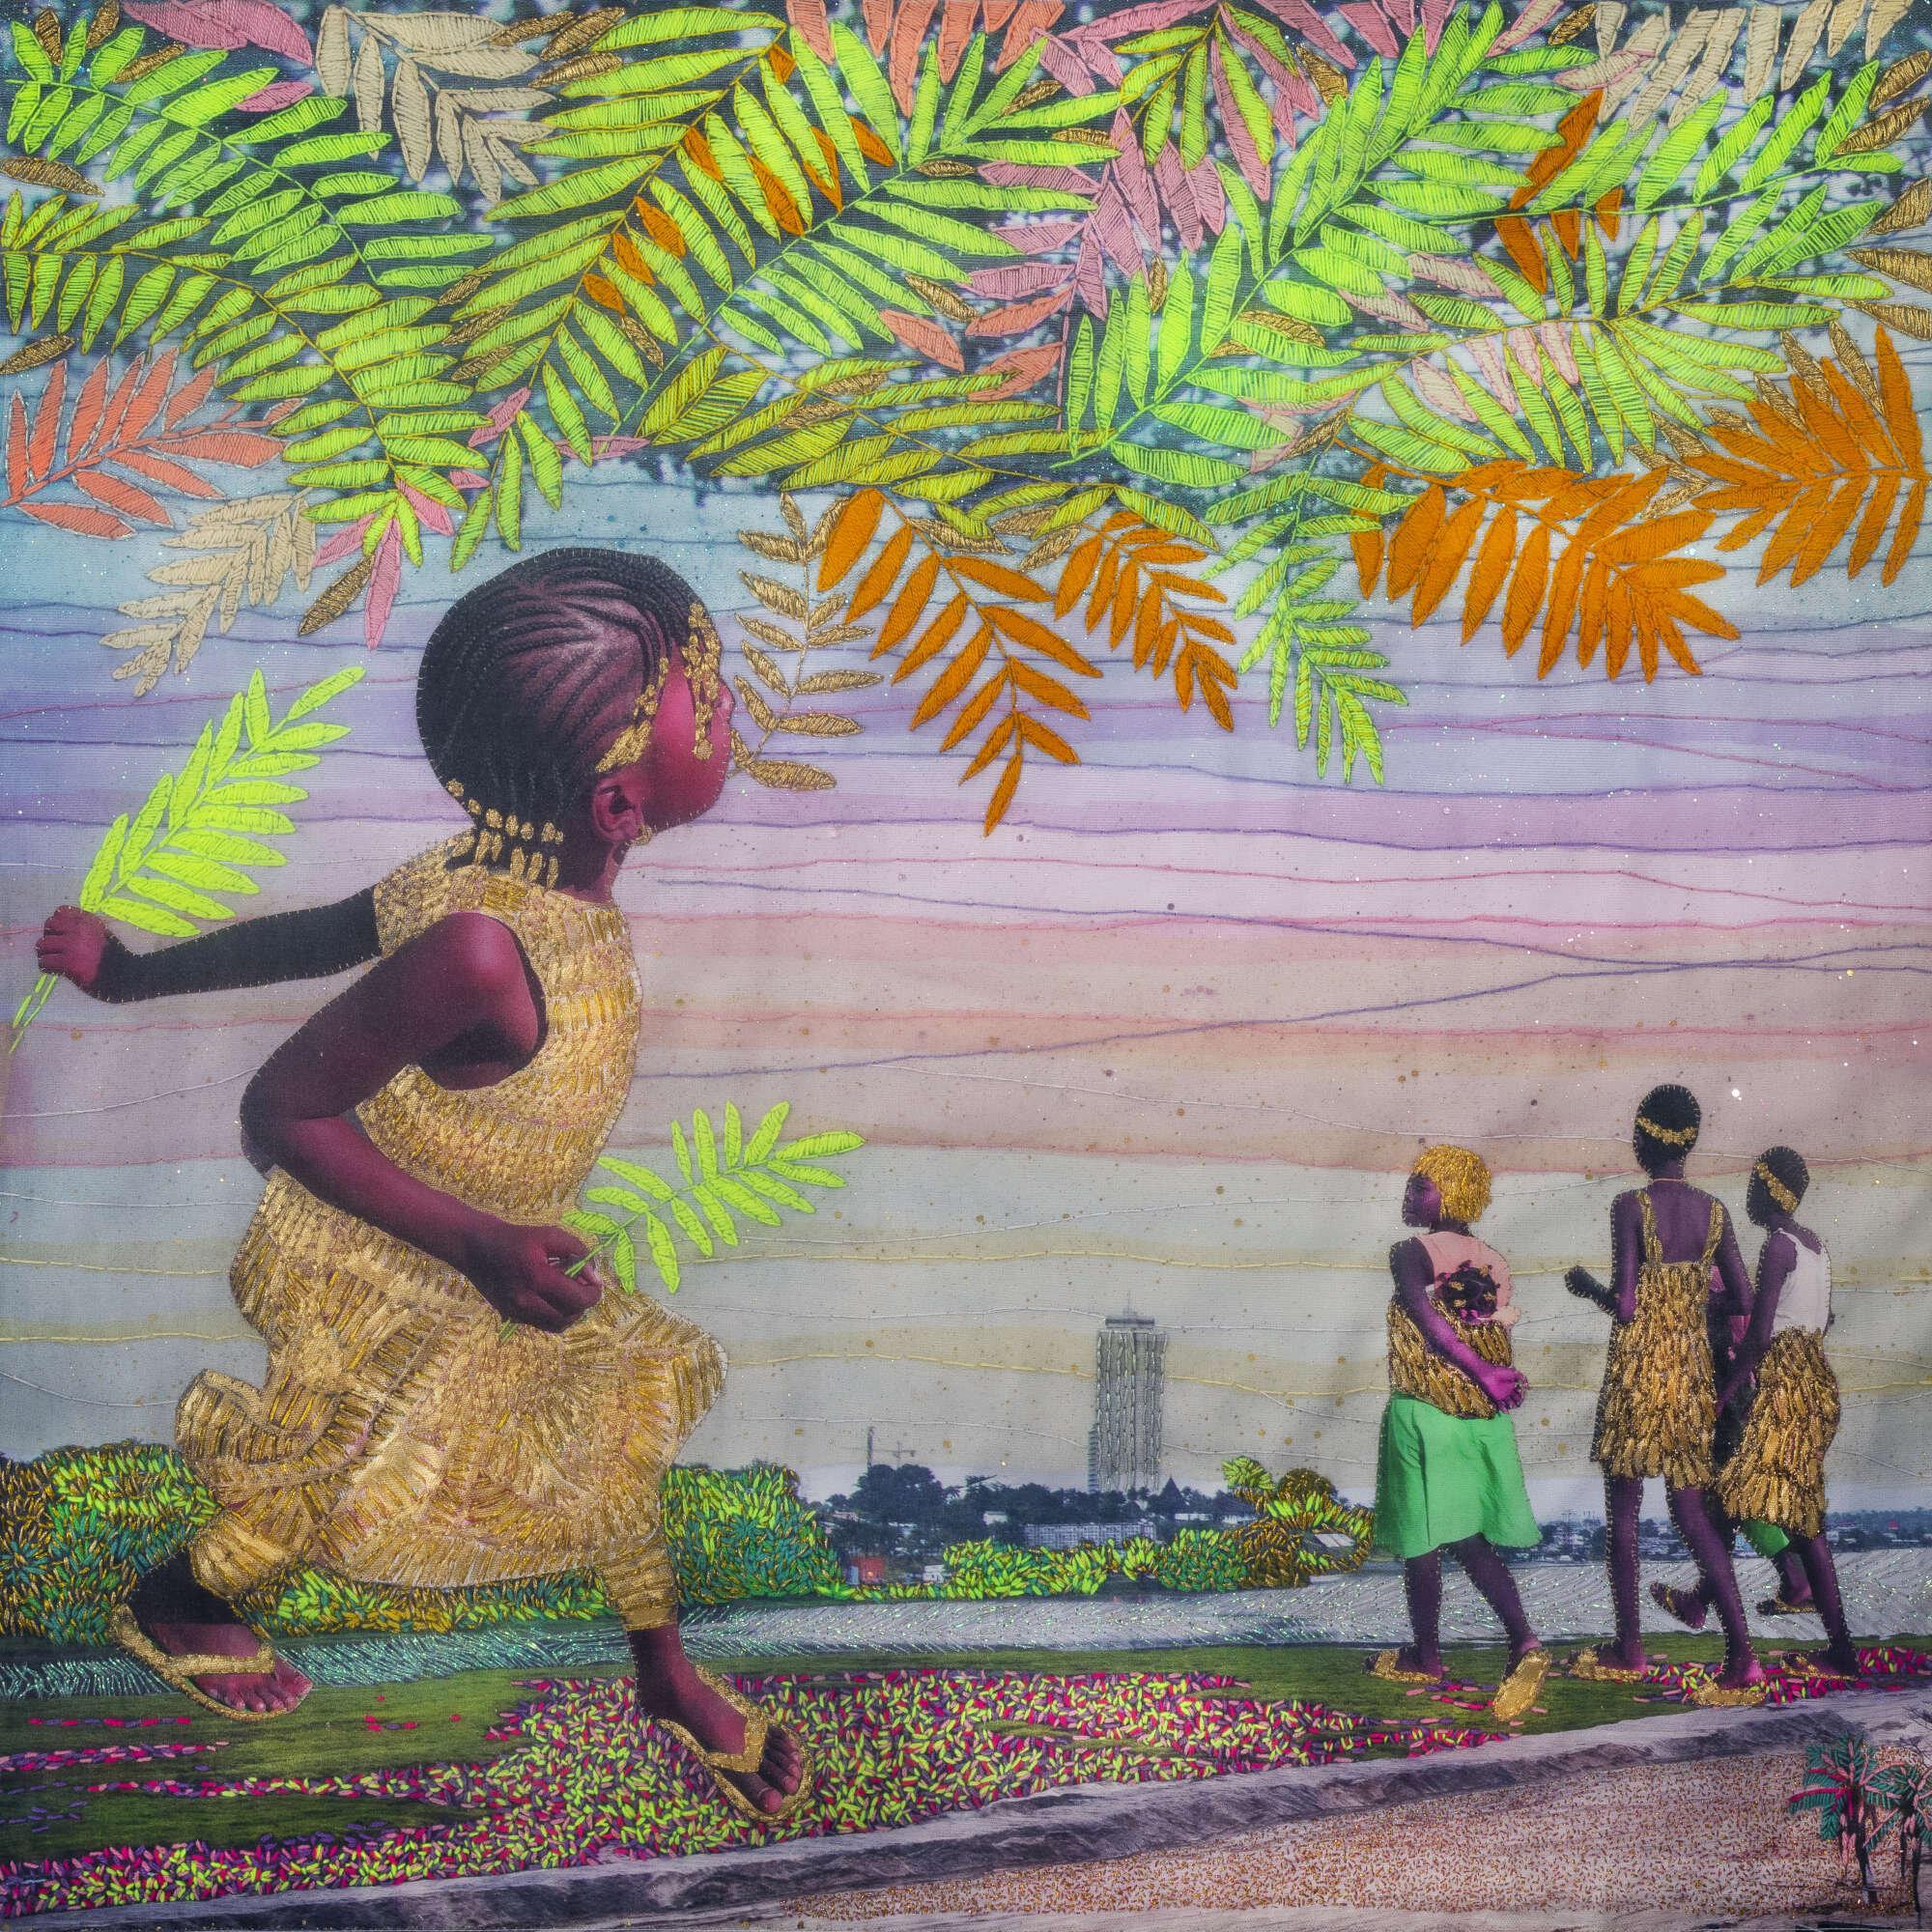 Joana Choumali, UNSAYING IT (2019). Series ALBAHIAN, 80x80cm. Image copyright the artist and courtesy Gallery 1957, Accra